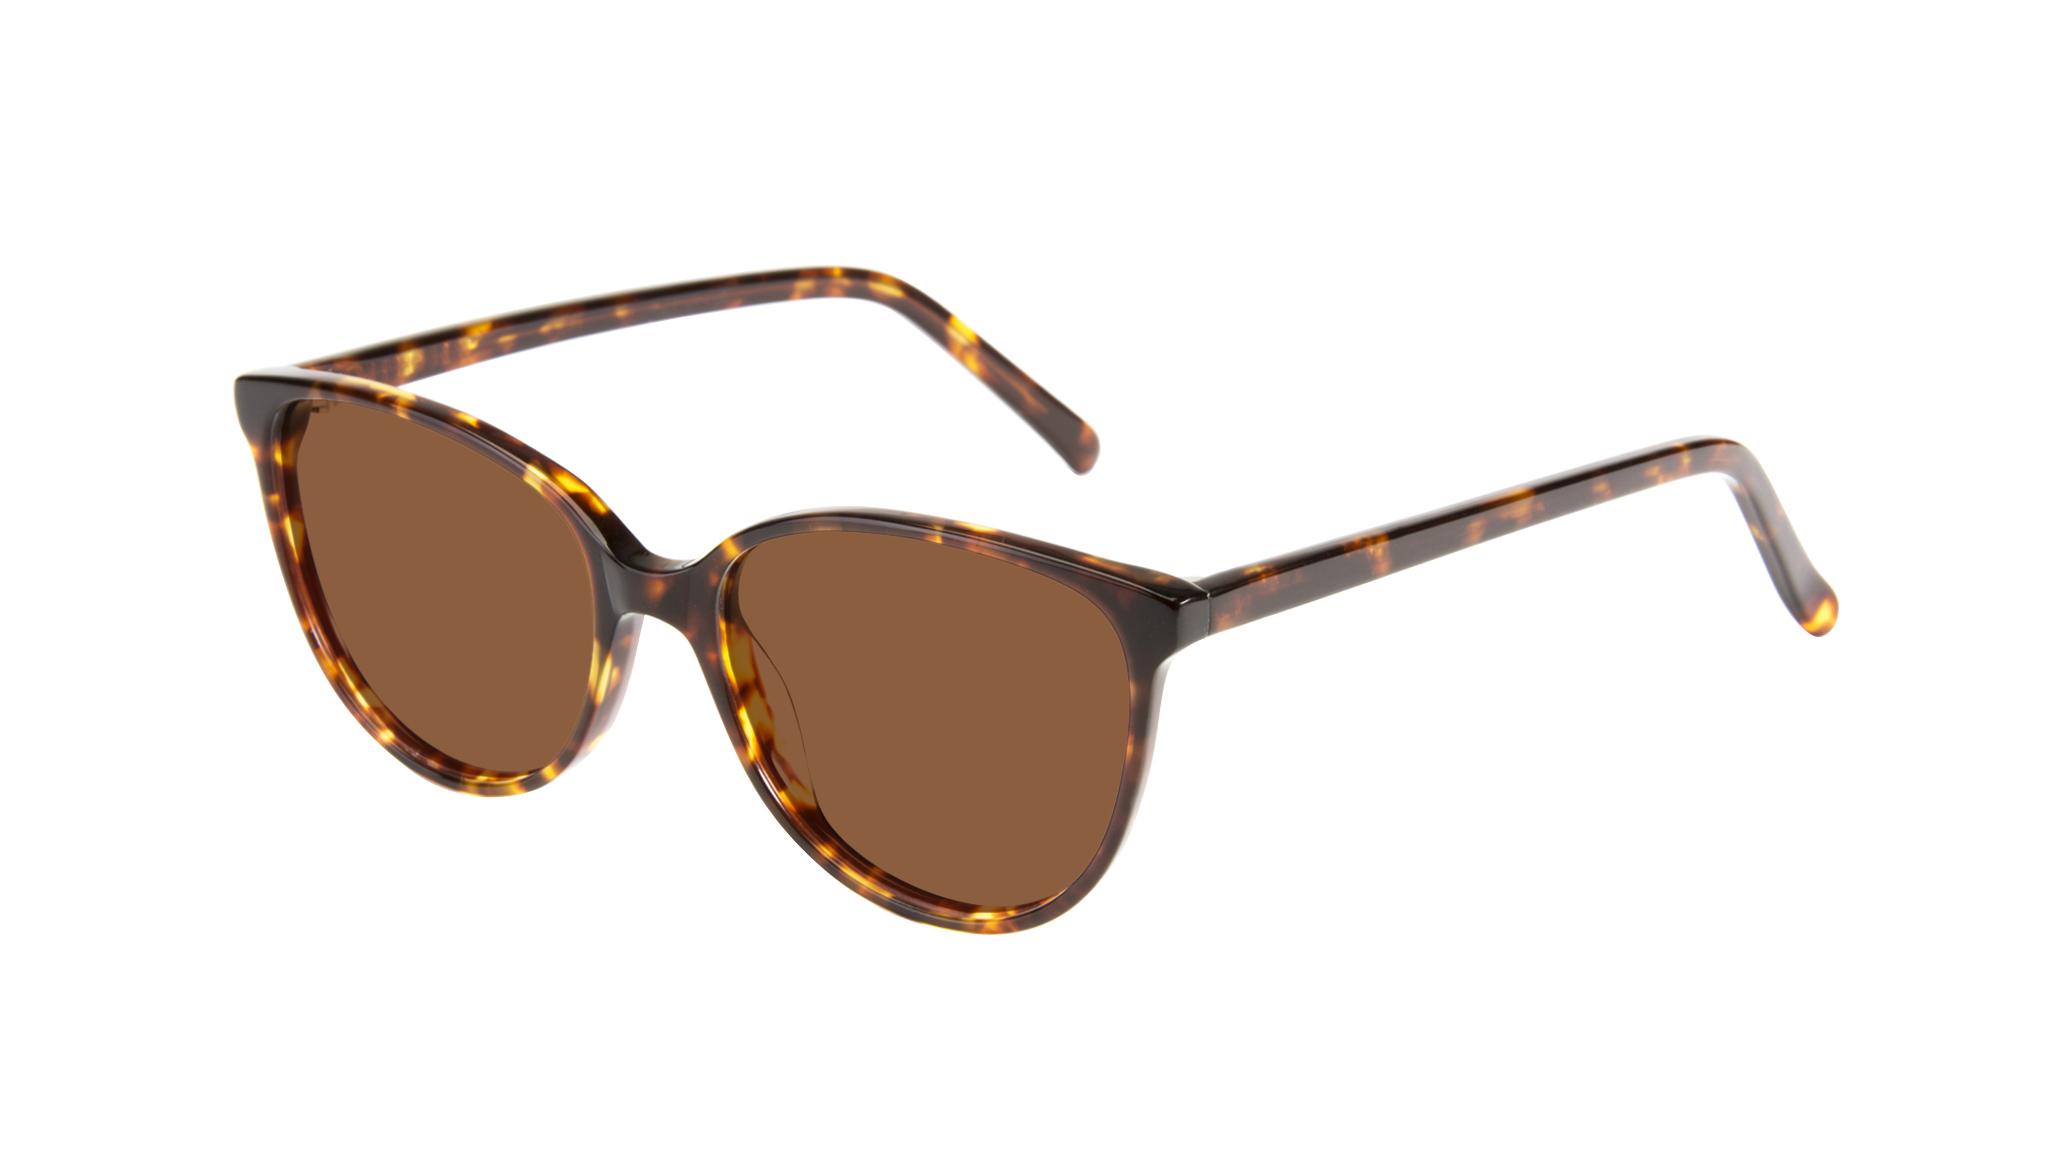 Kiss Tortoise Fashion Sunglasses Shades with Amber Lens